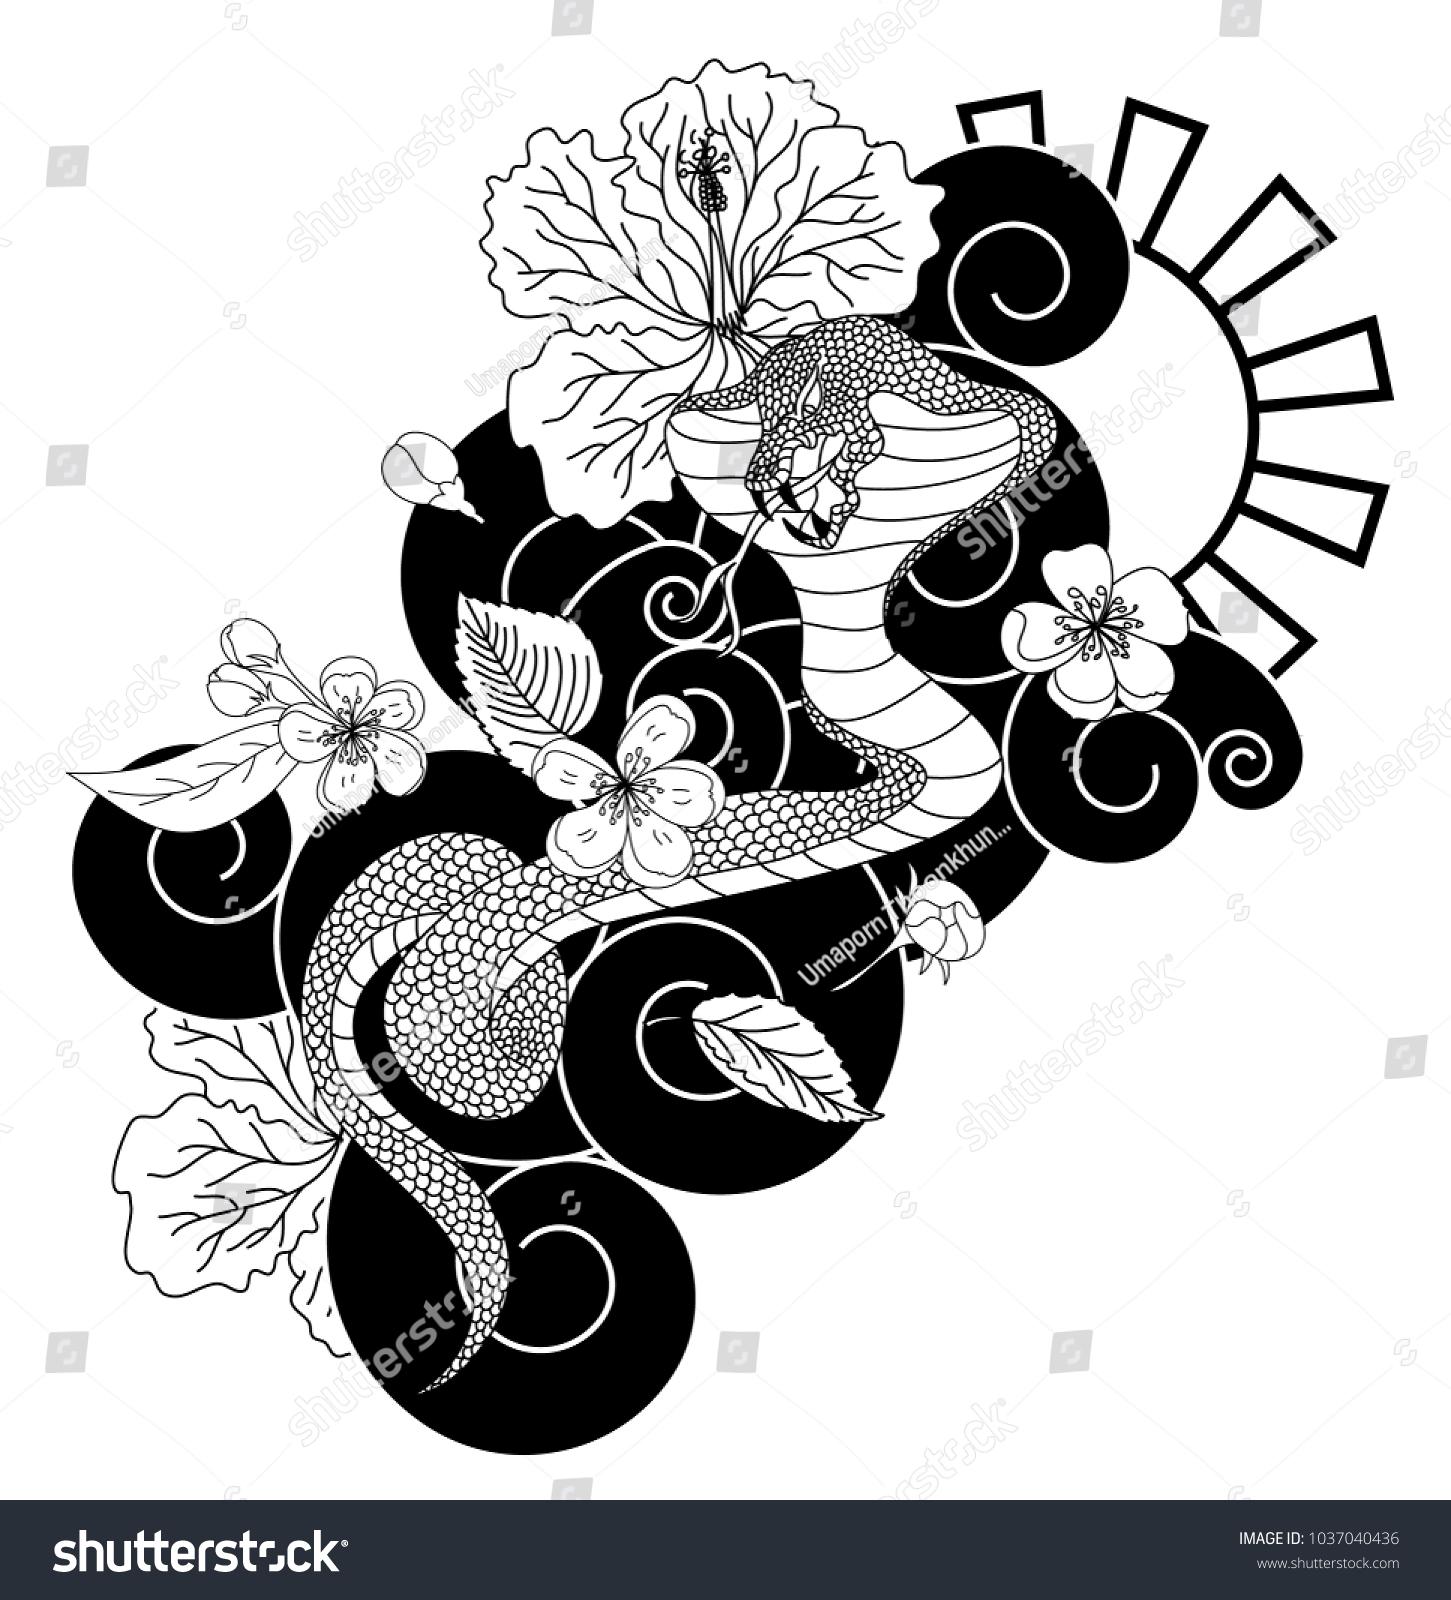 Black white vector snake cherry blossom stock vector royalty free black and white vector snake with cherry blossom and cloud backgroundhibiscus flower with sakura izmirmasajfo